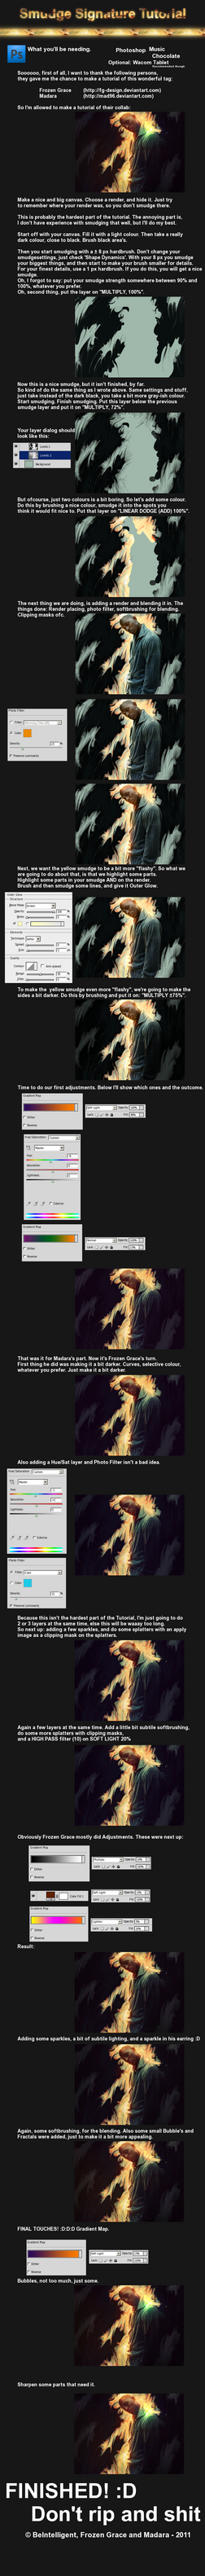 Smudge tutorial 3 by FG-design